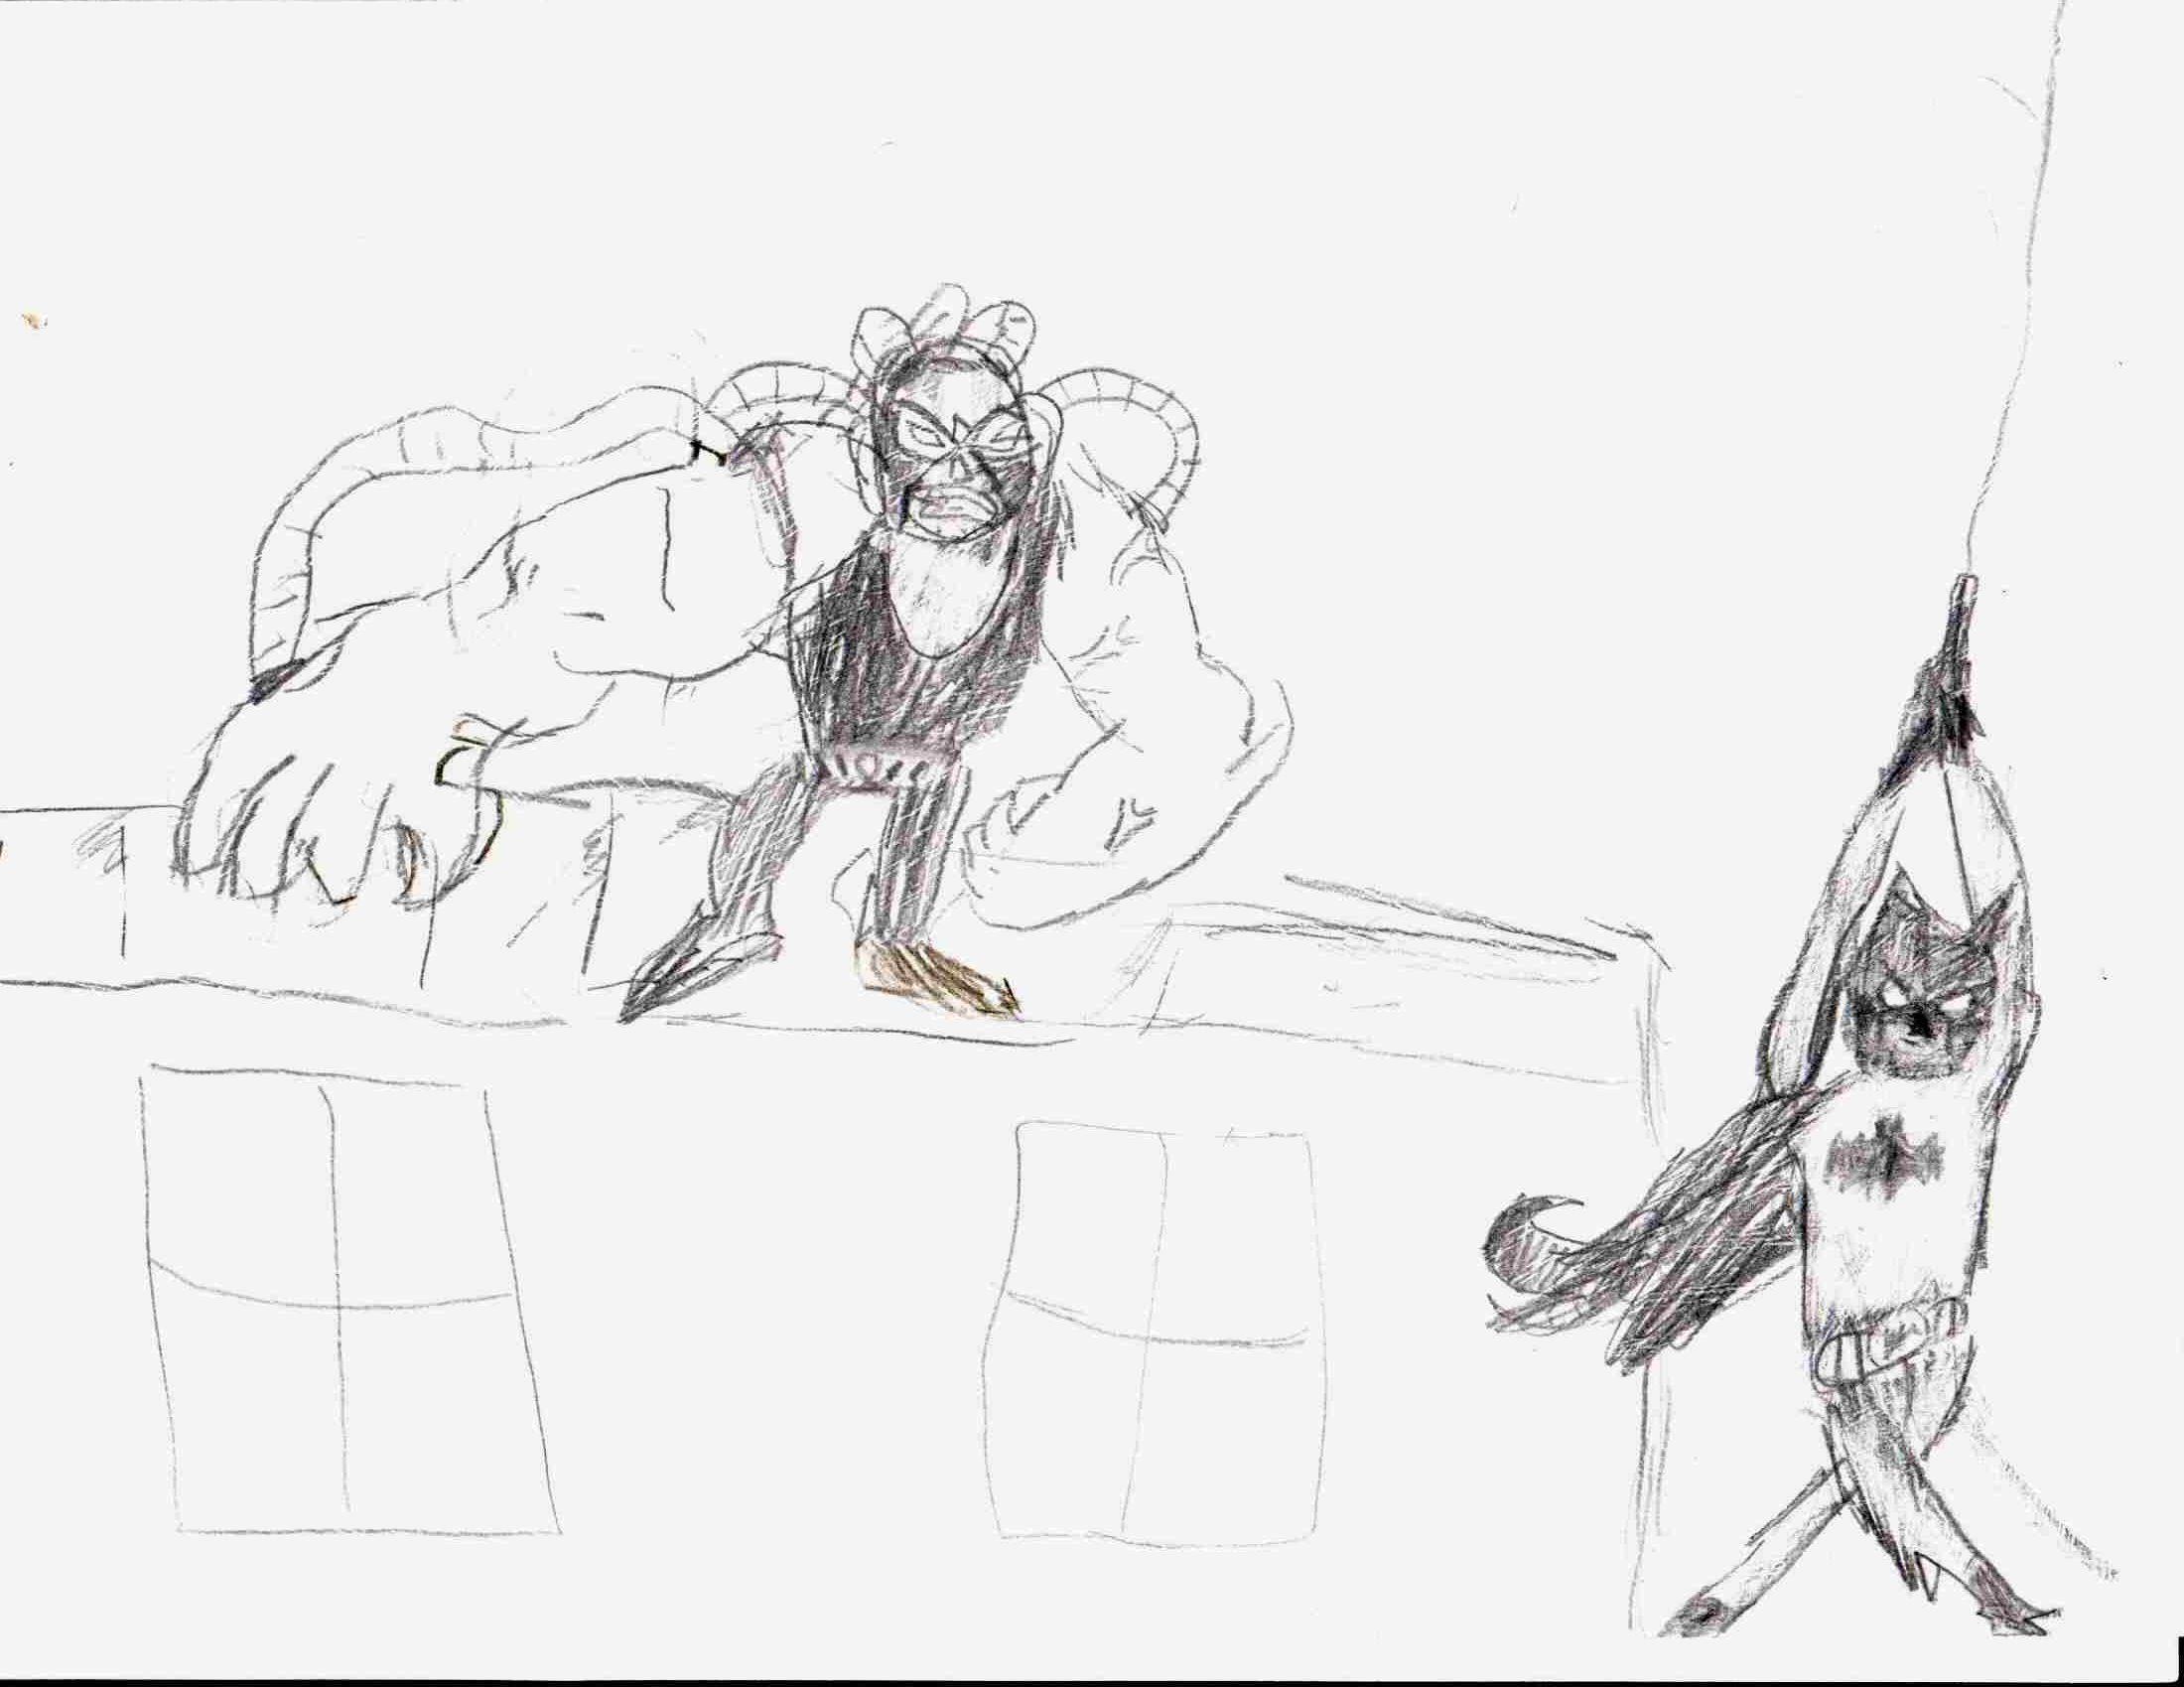 Бэйн из Batman: ARKHAM KNIGHT нарисовал Даня